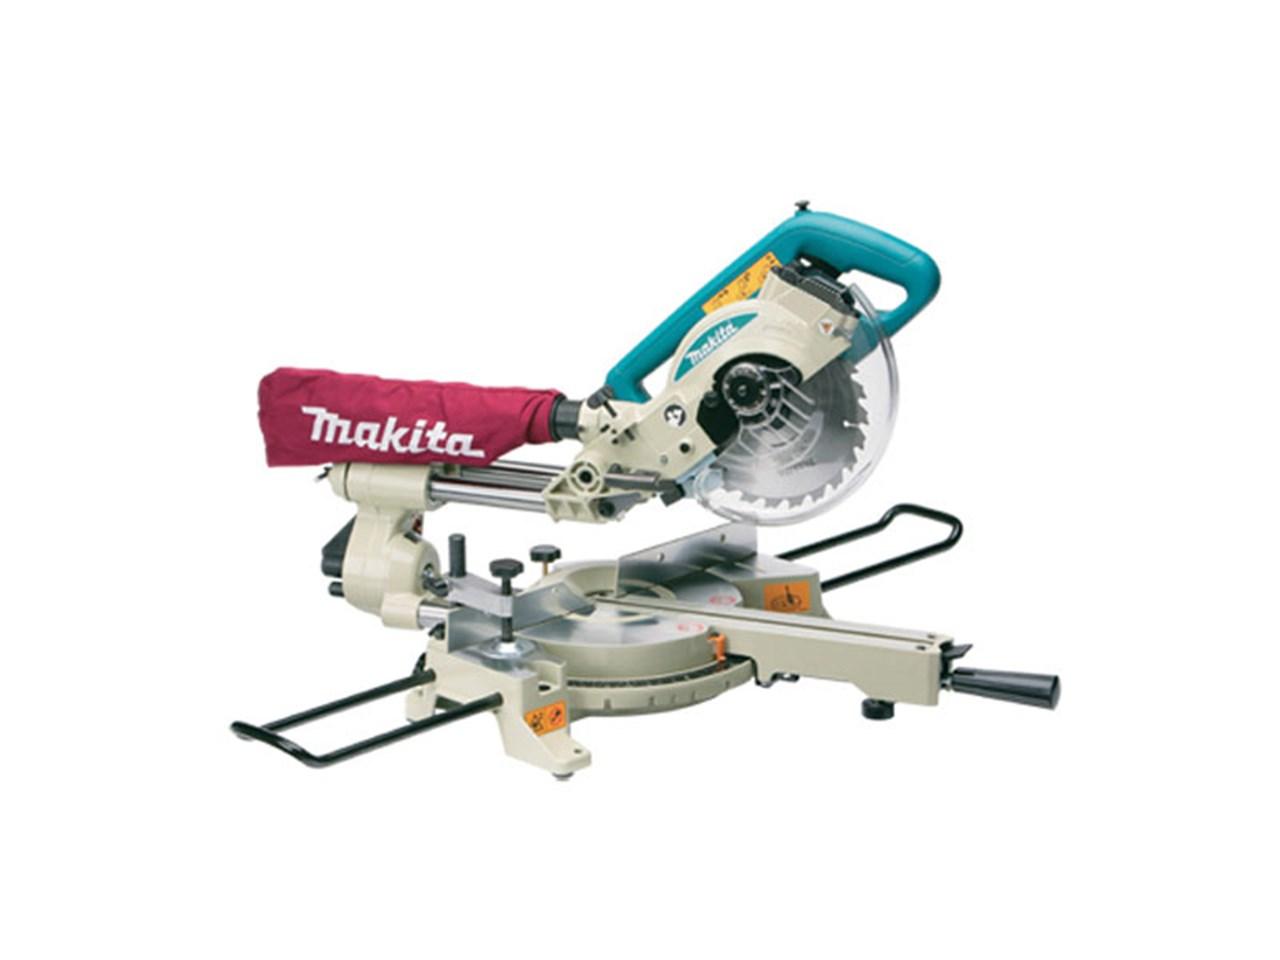 Makita ls0714 240v 190mm slide compound mitre saw greentooth Choice Image